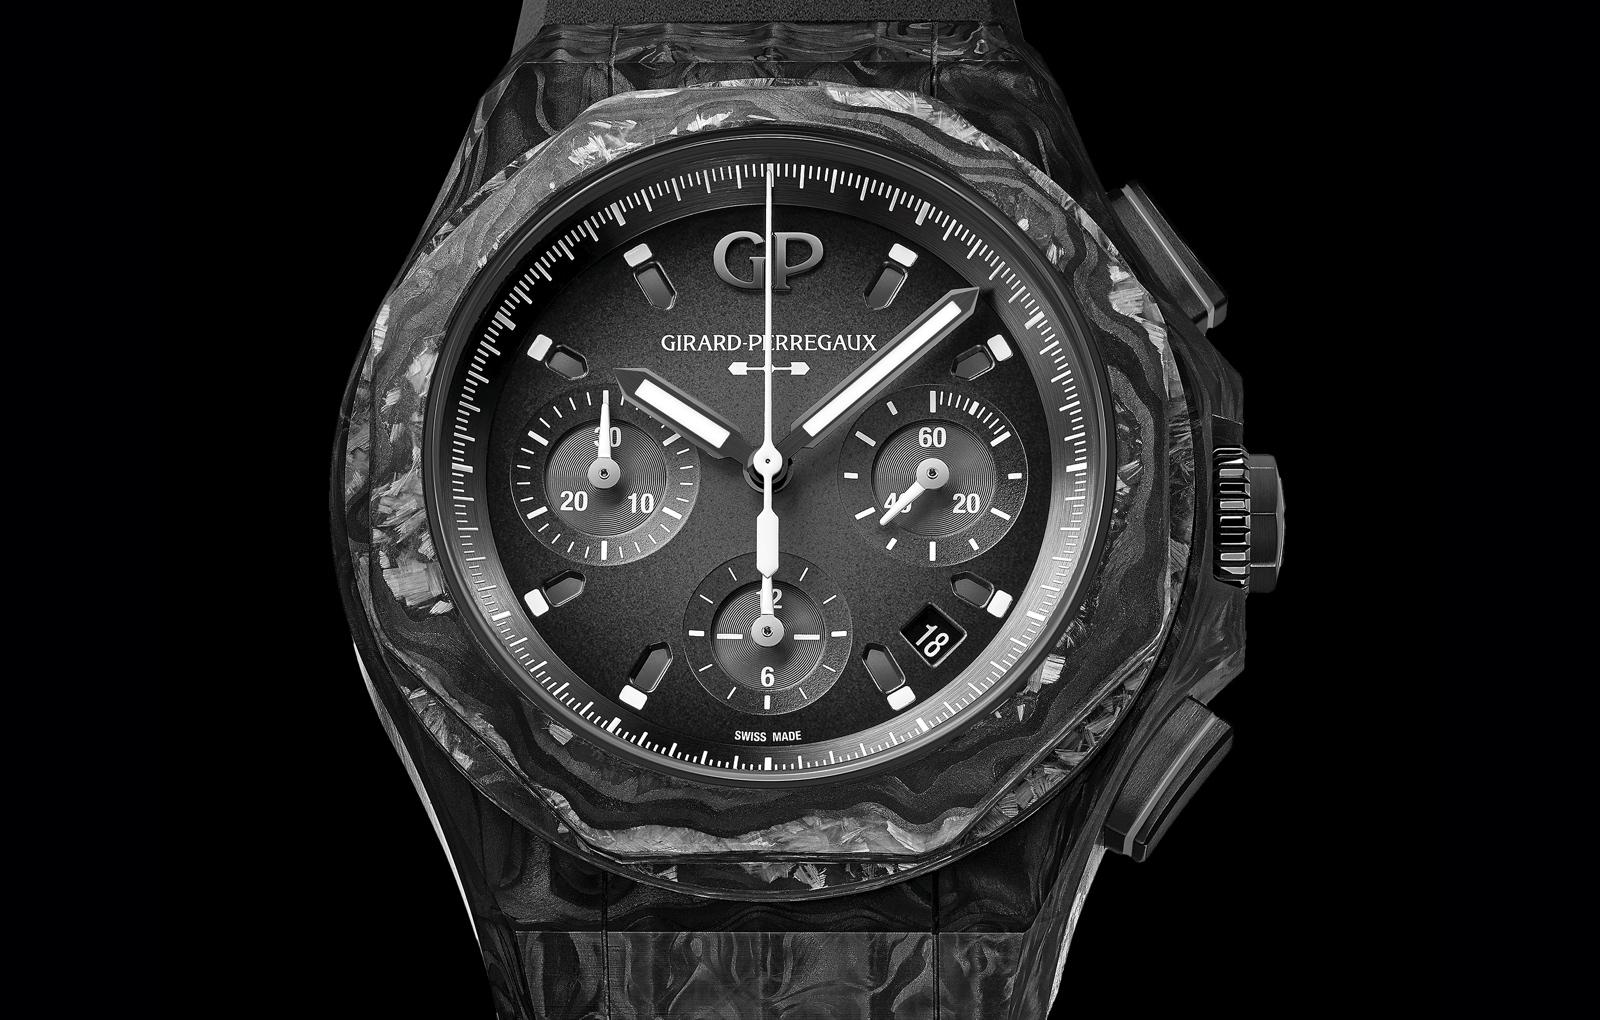 Girard-Perregaux Laureato Absolute Crystal Rock - dial